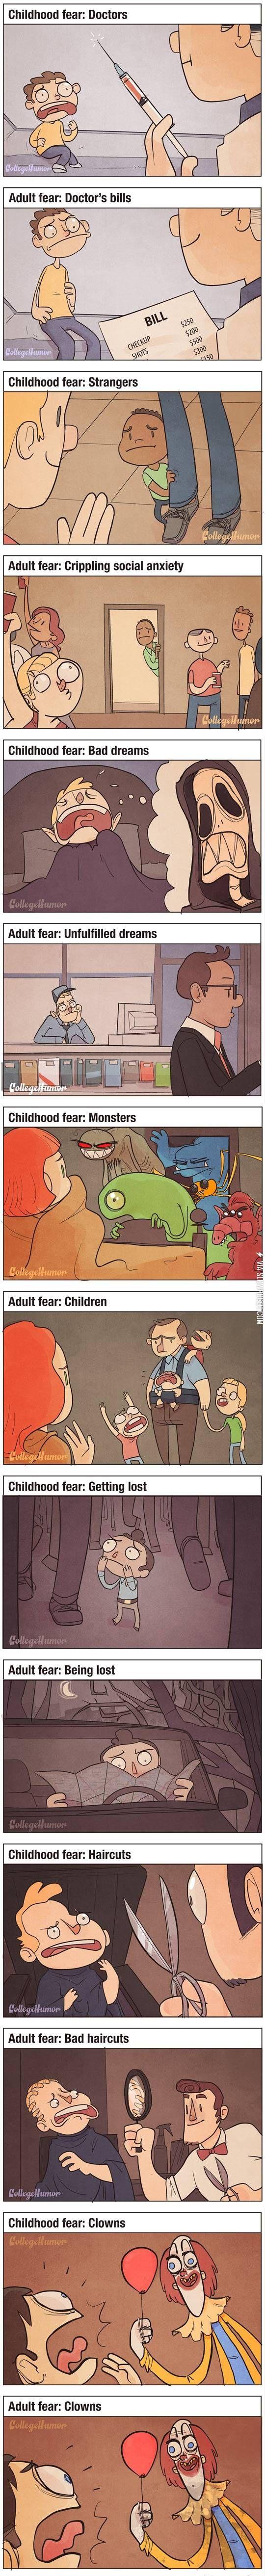 Childhood vs. adult fears.